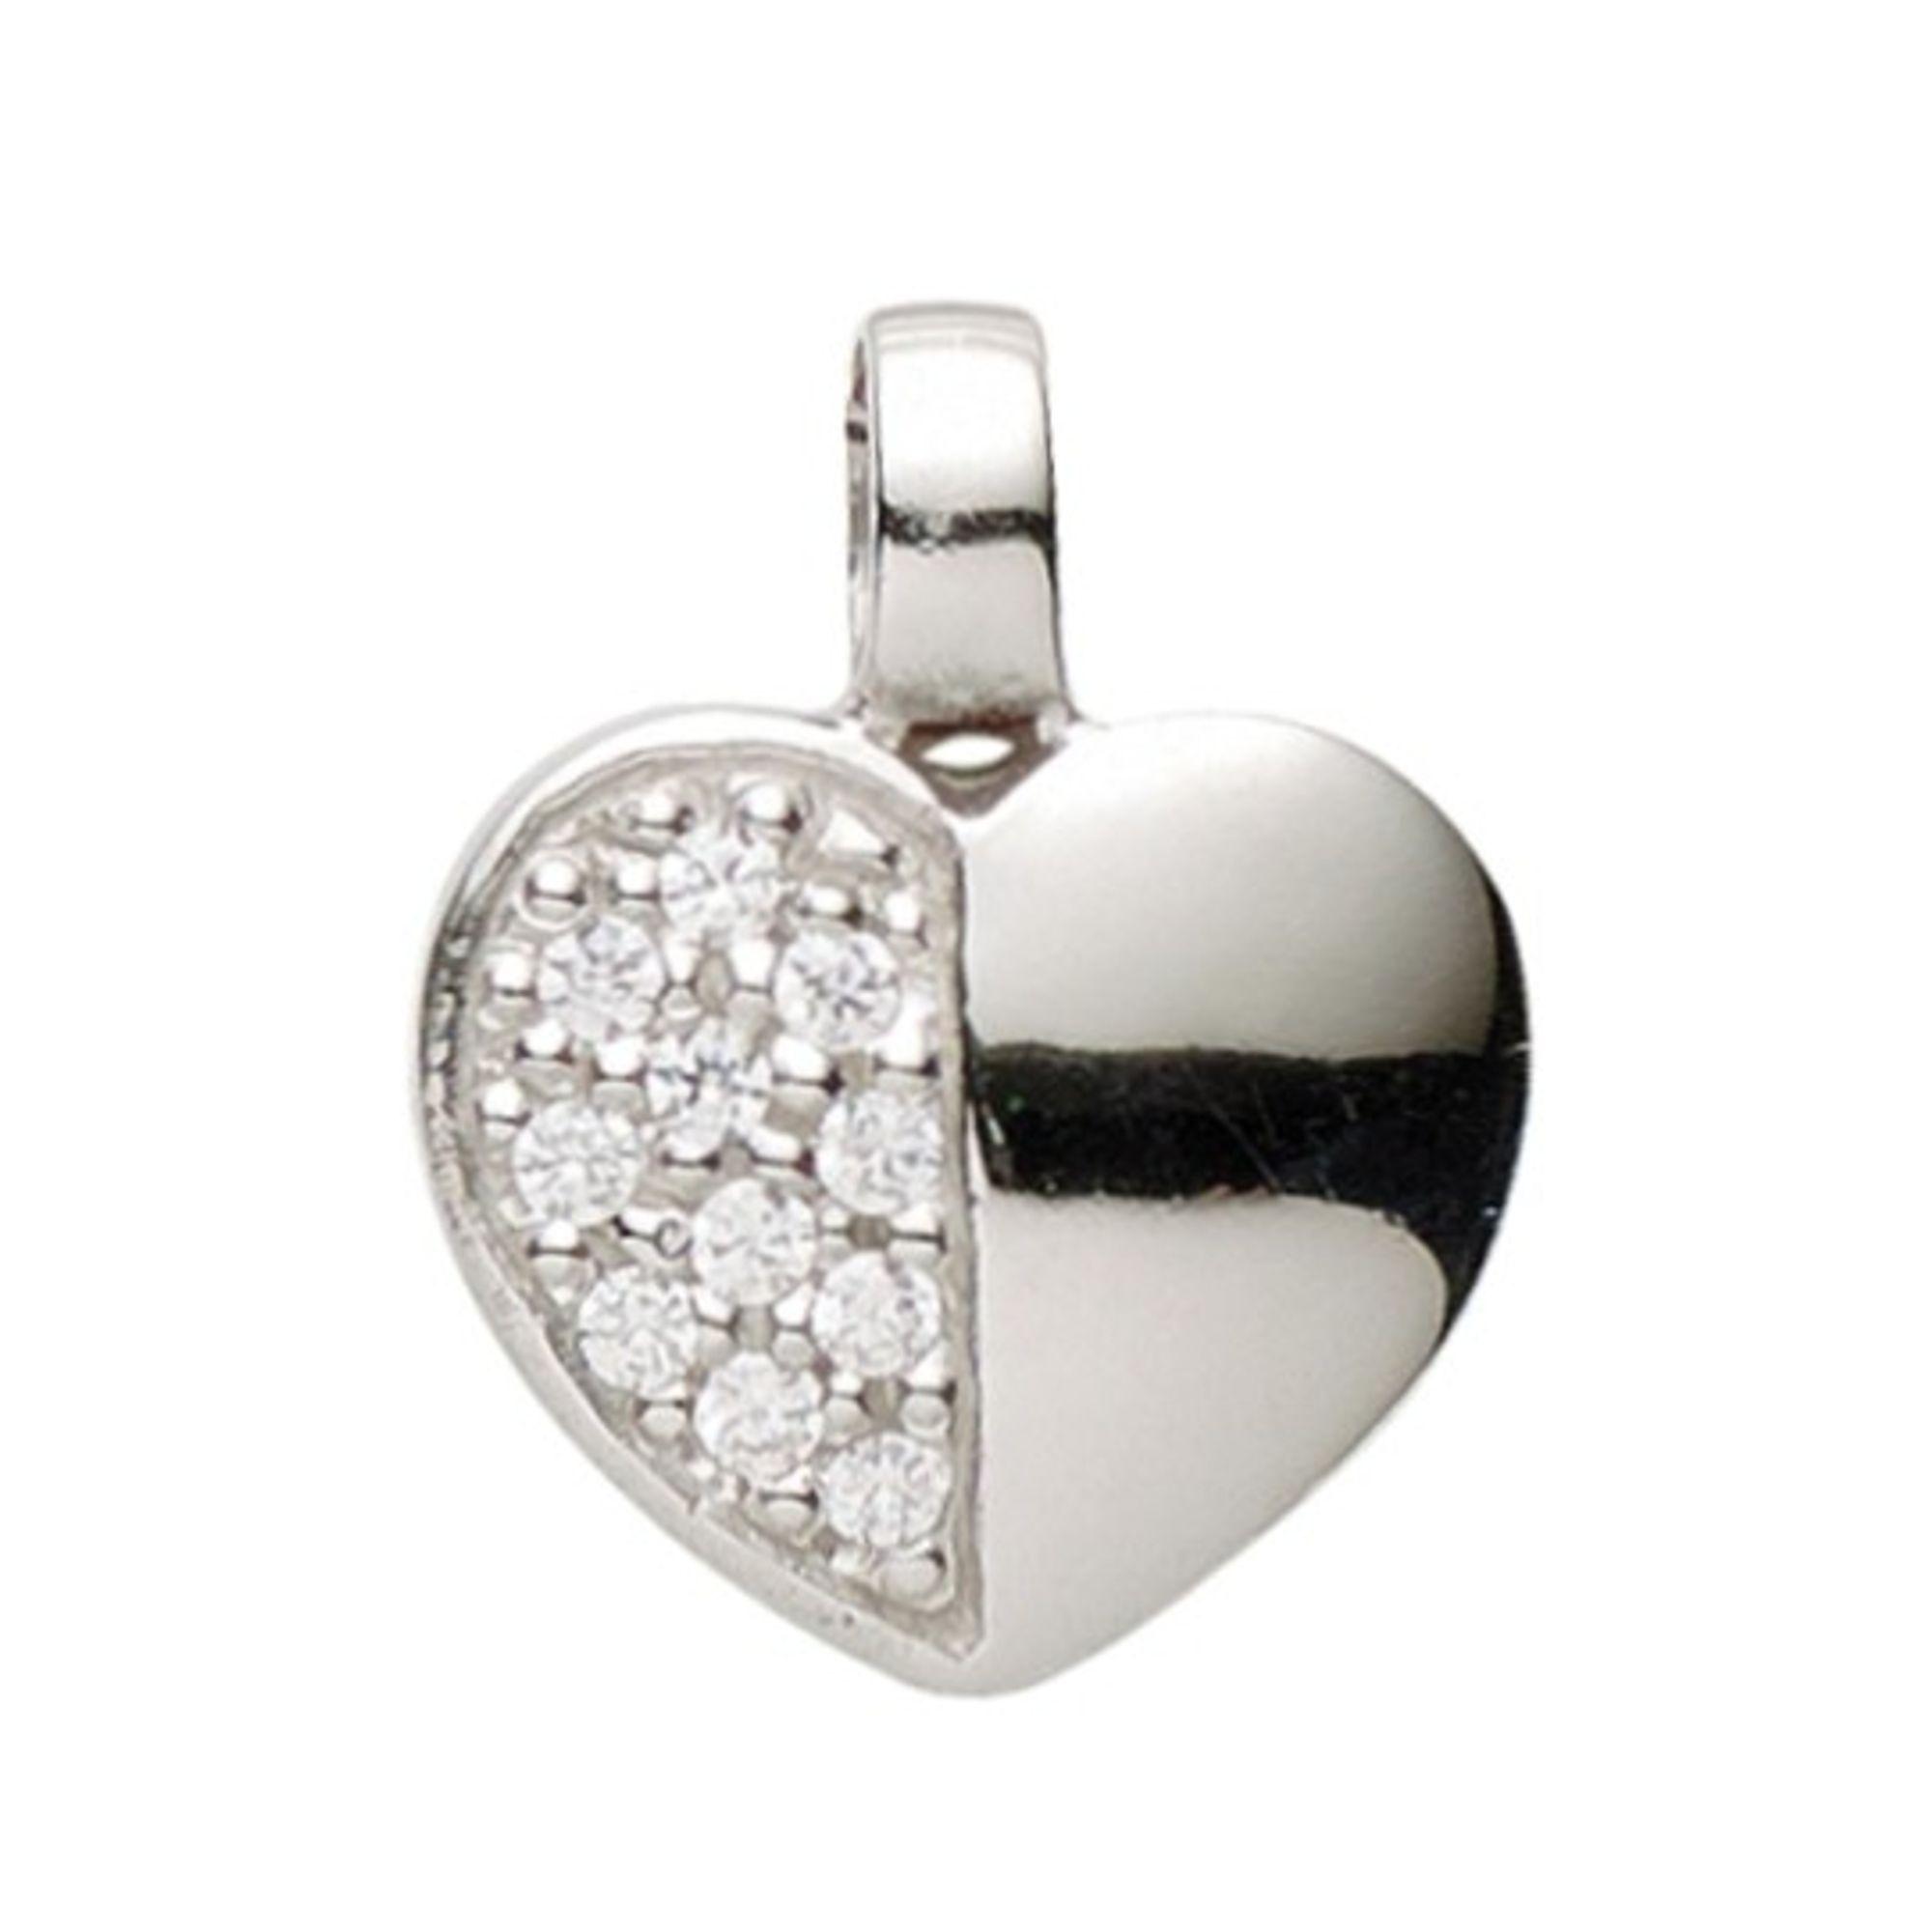 Basic Silber 21.1126S Damen Anhänger Herz Silber Zirkonia weiß